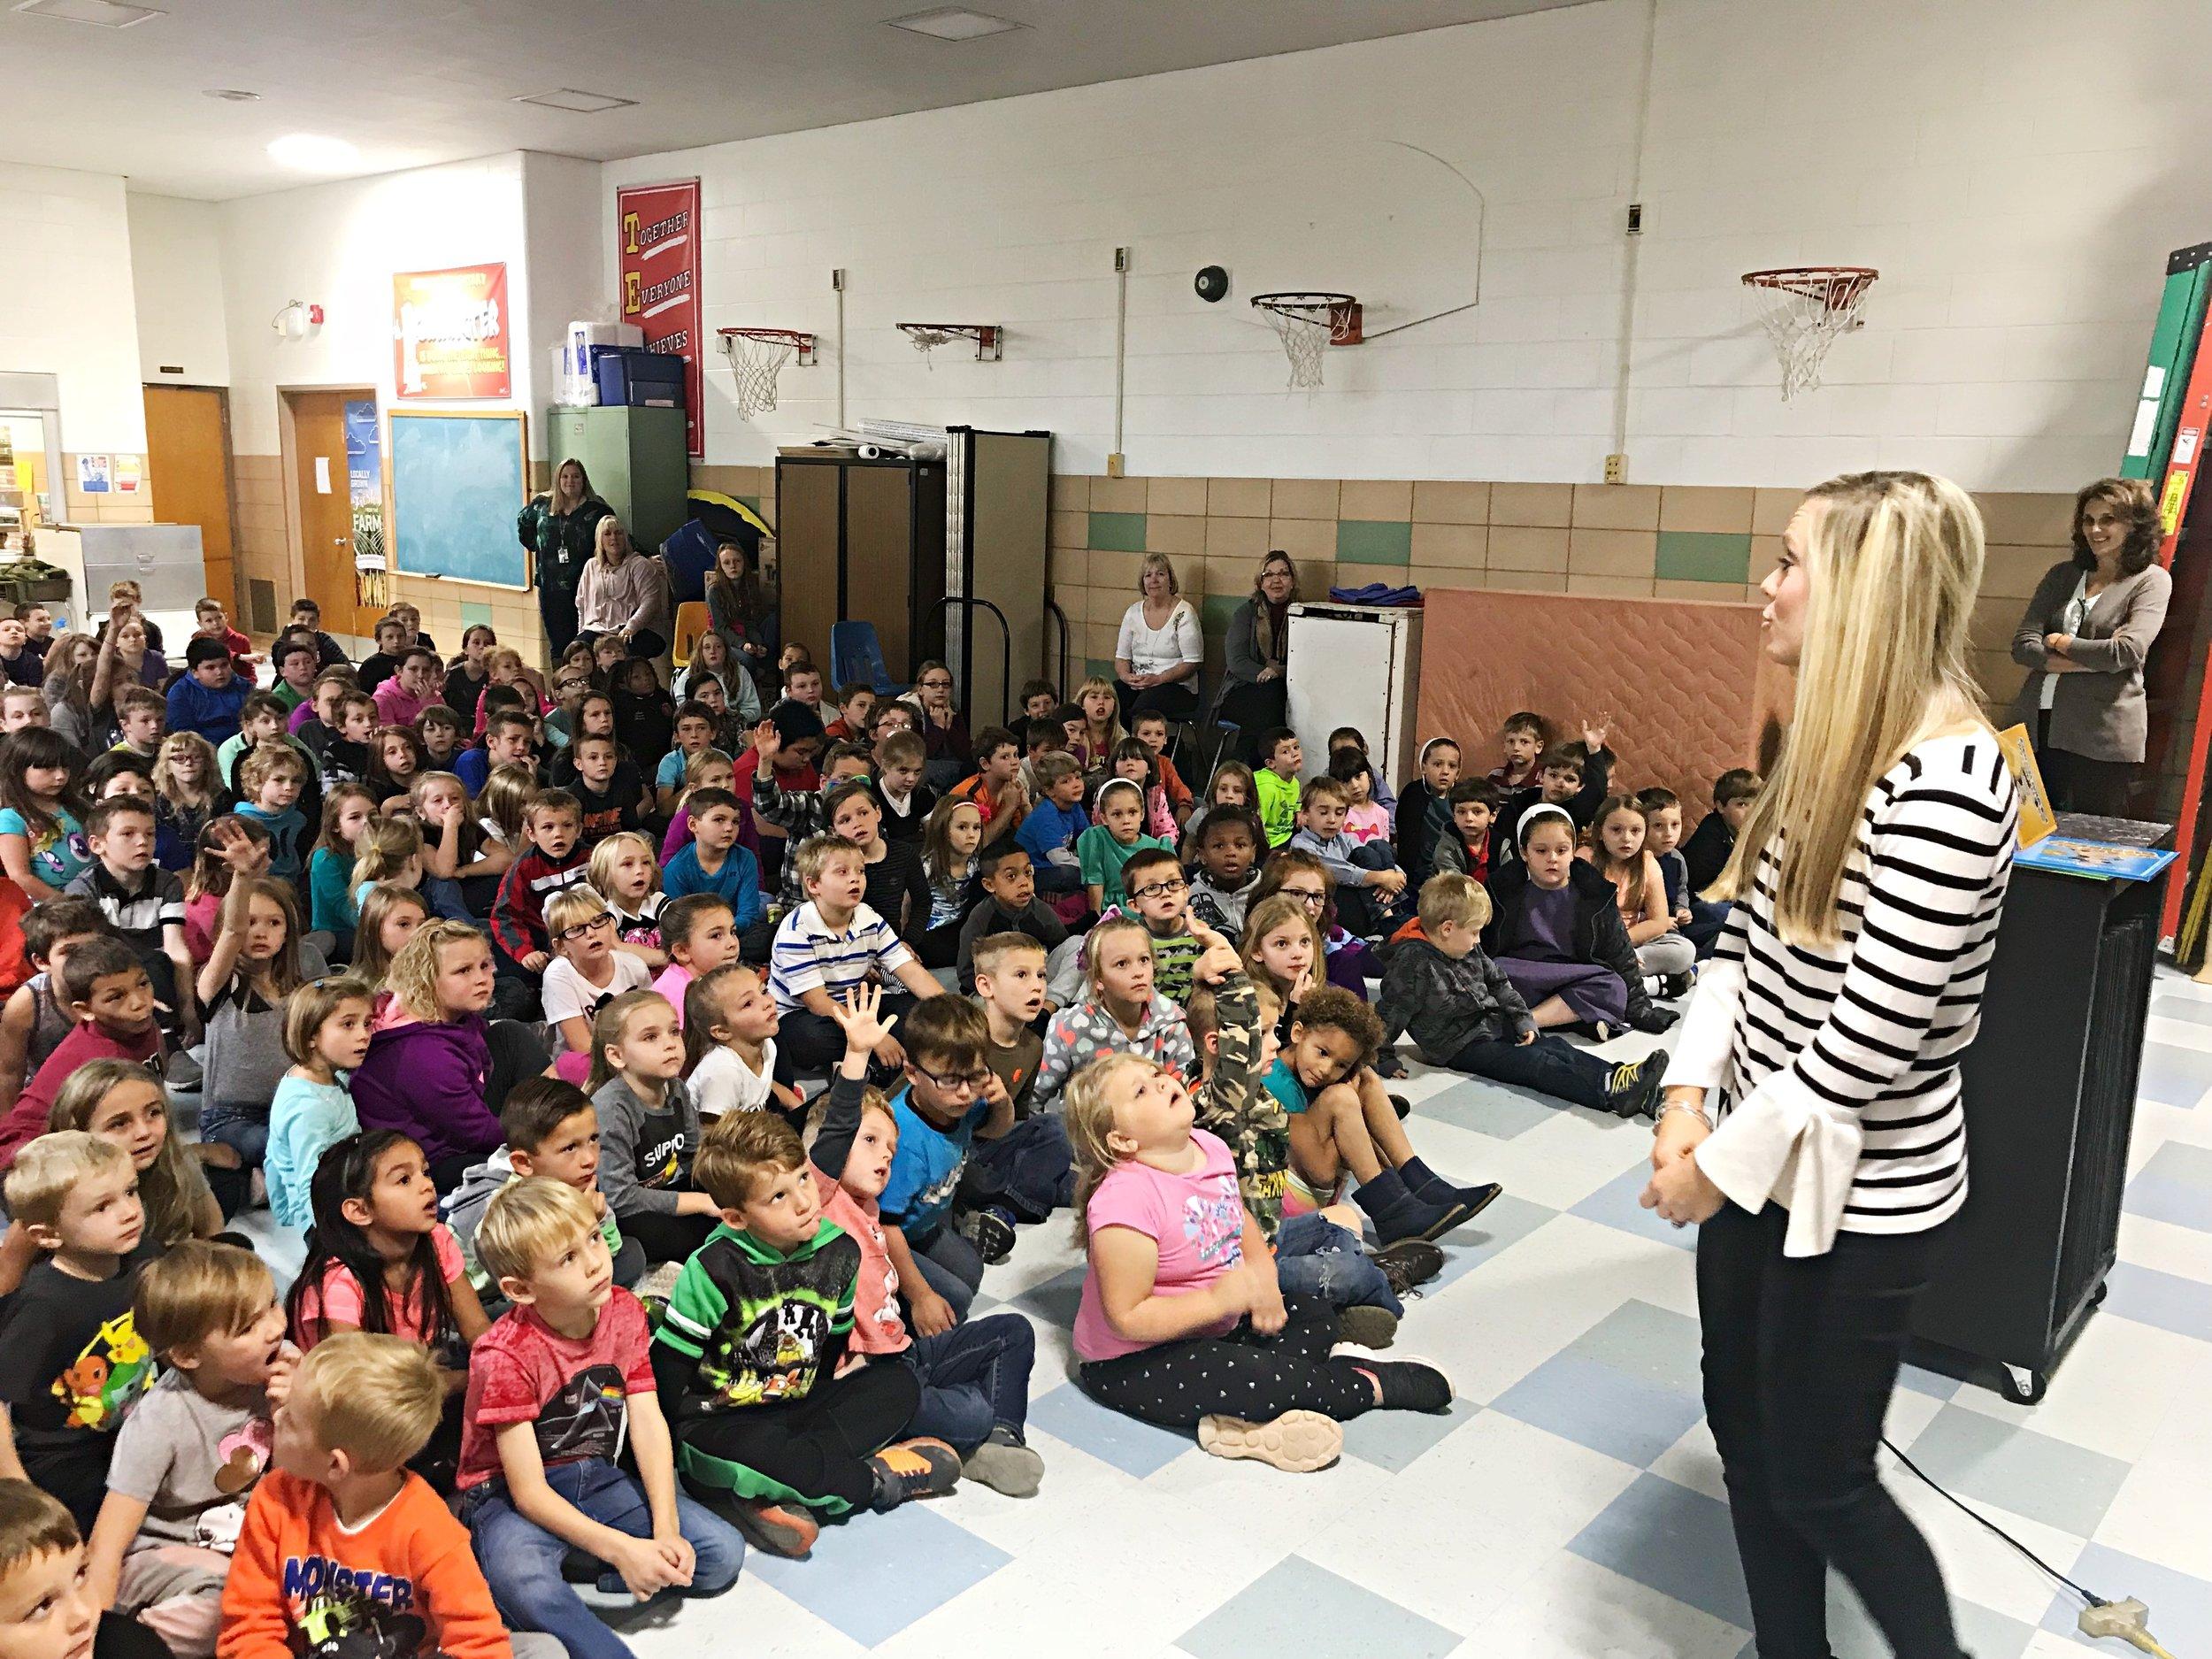 Crellin Elementary